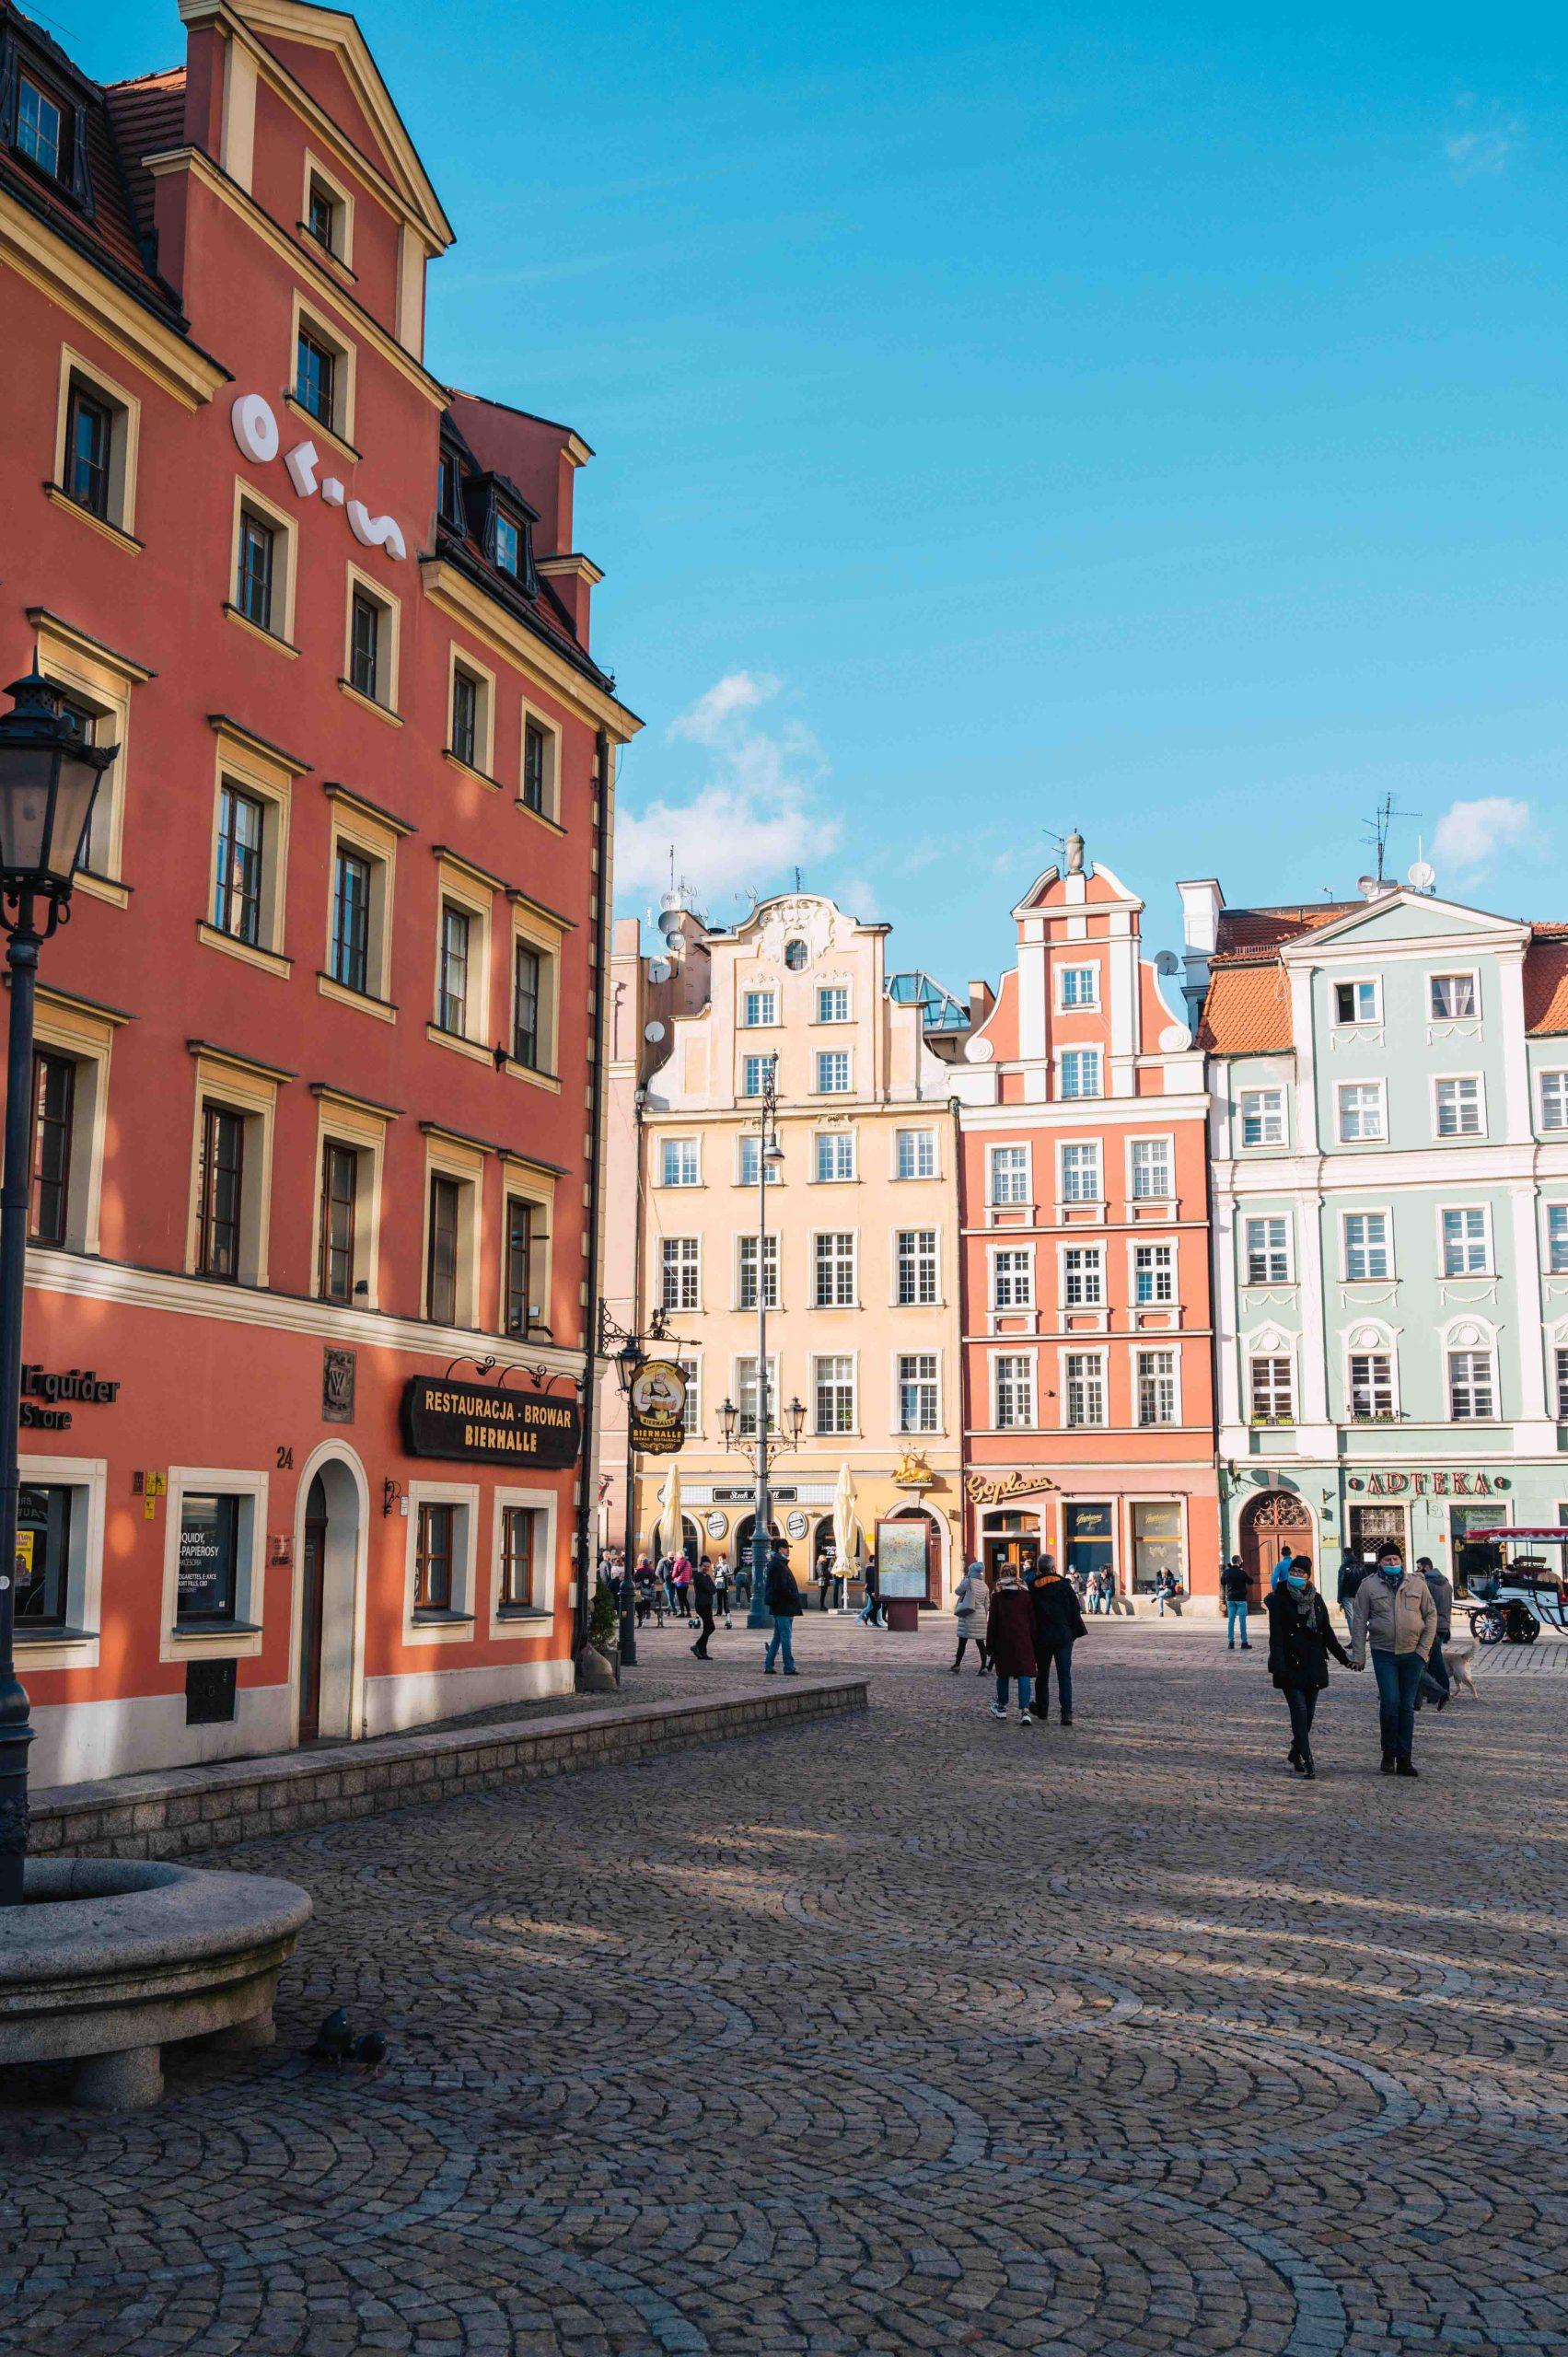 Rynek, the Market Square in Wroclaw (Breslau) in Poland